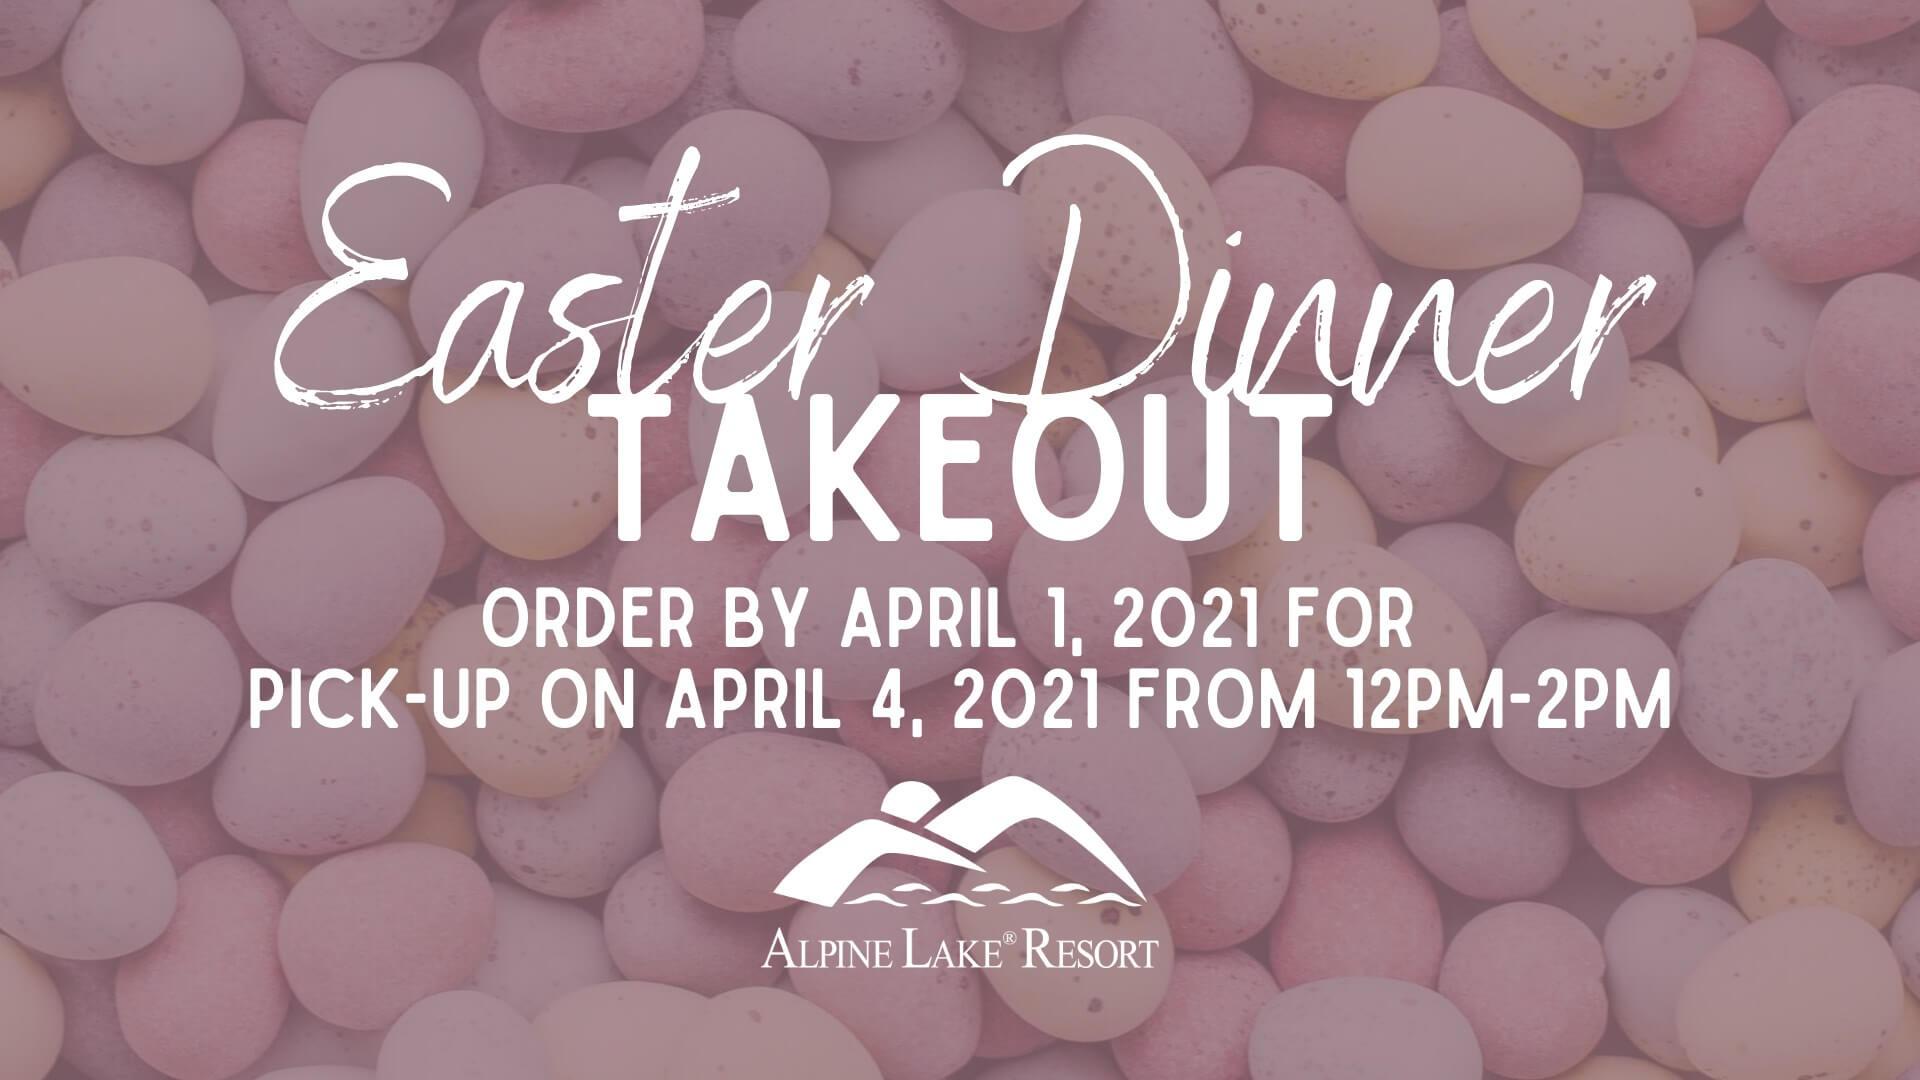 Alpine Lake Resort: Easter Dinner Takeout